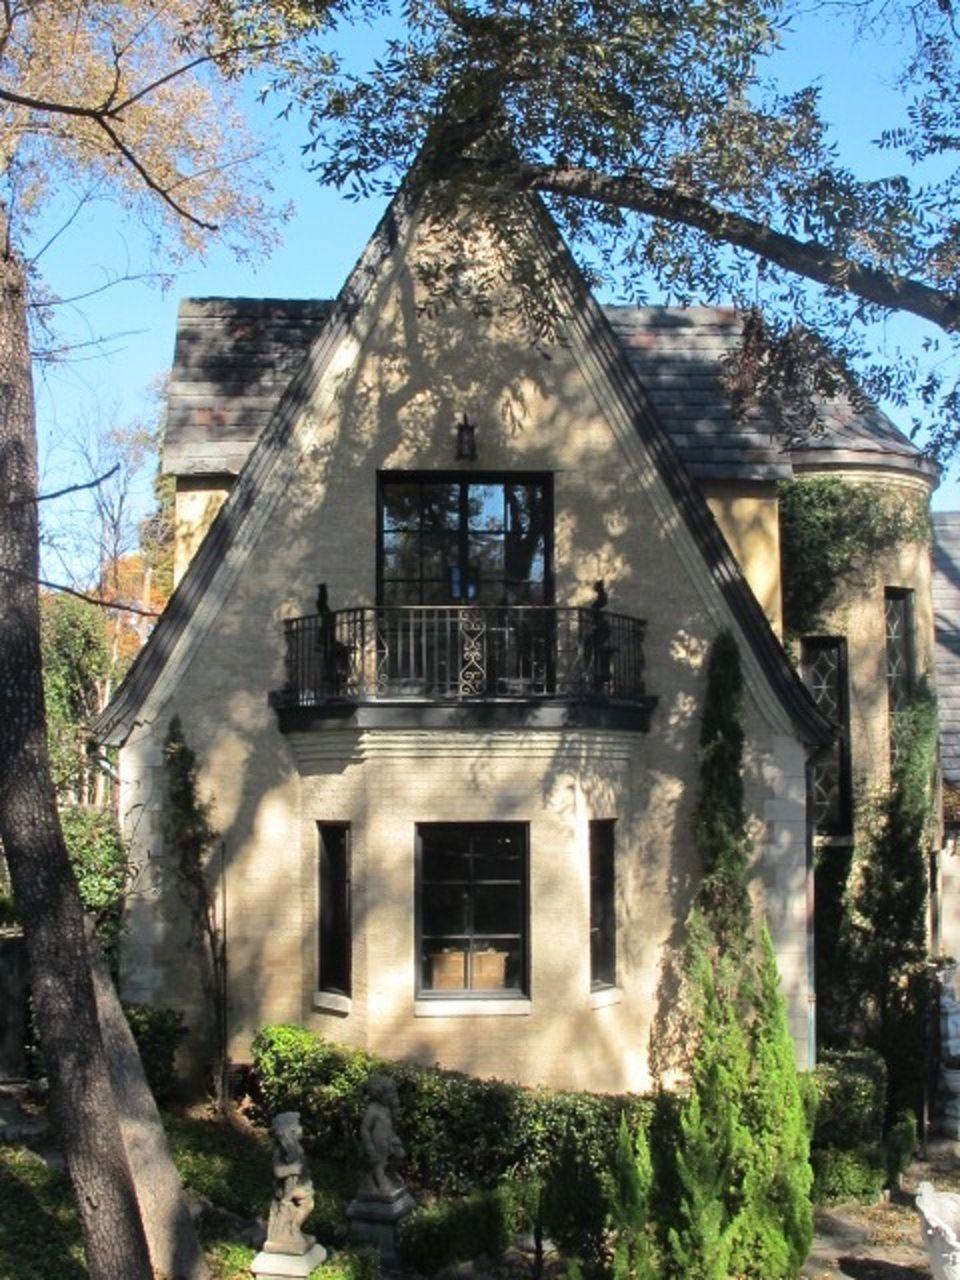 Castle Mansions Home Photo Video Location Shoot Dallas 14.jpg